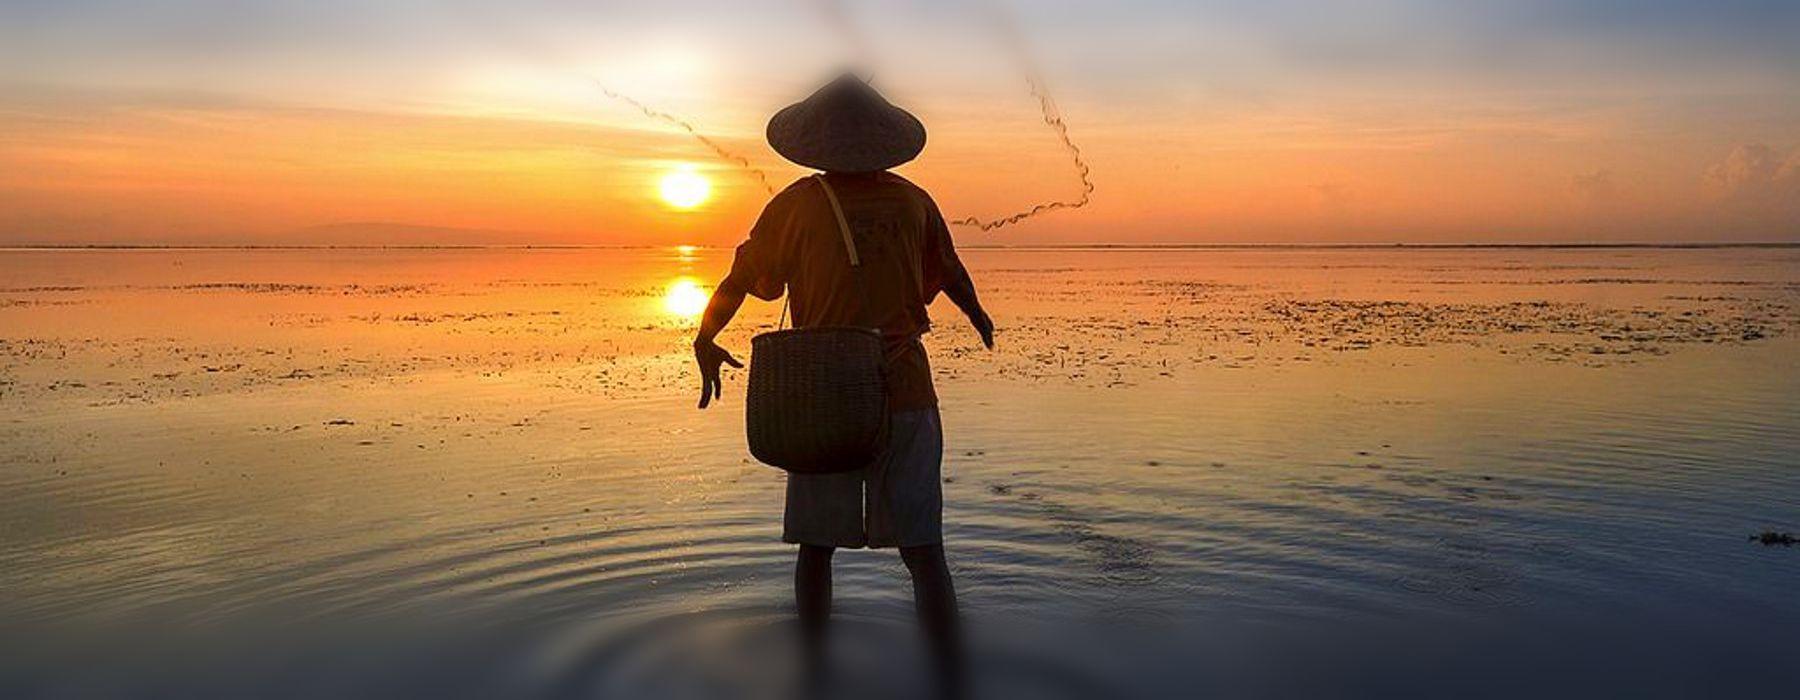 pachet turistic Singapore Bali cover